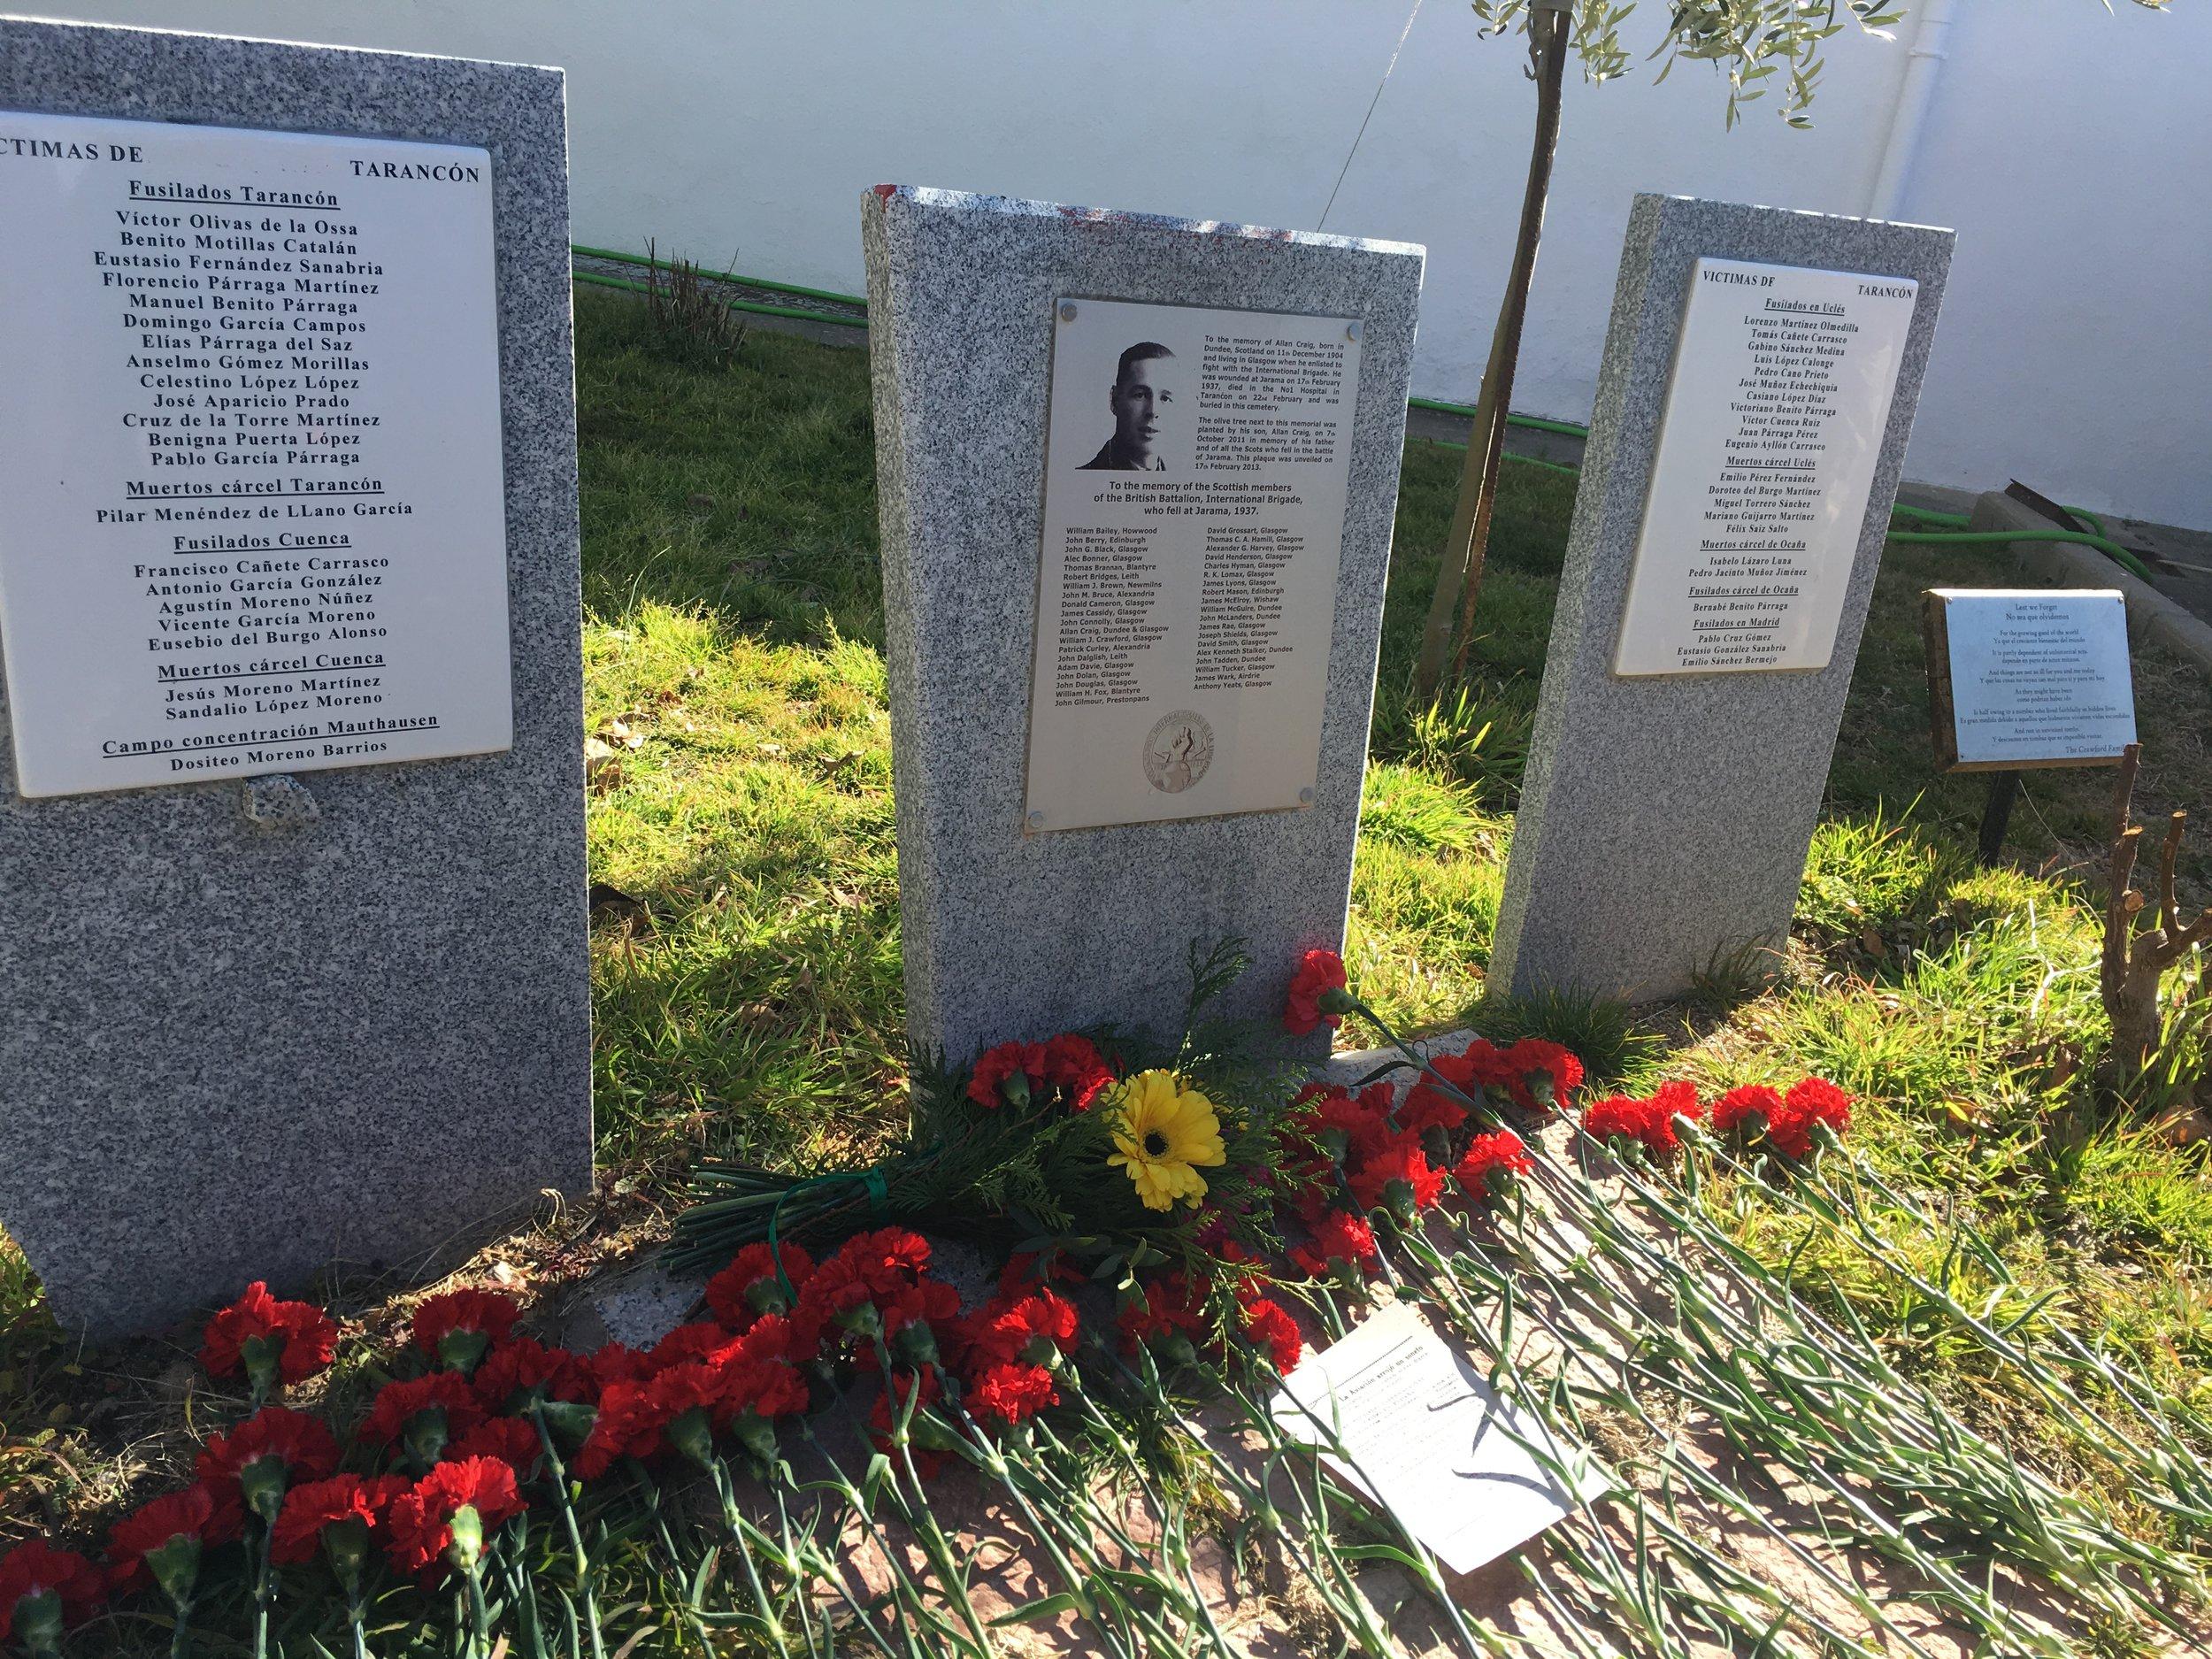 Memorial to Scottish International Brigade volunteers and Spanish Republican fighters in Taracon